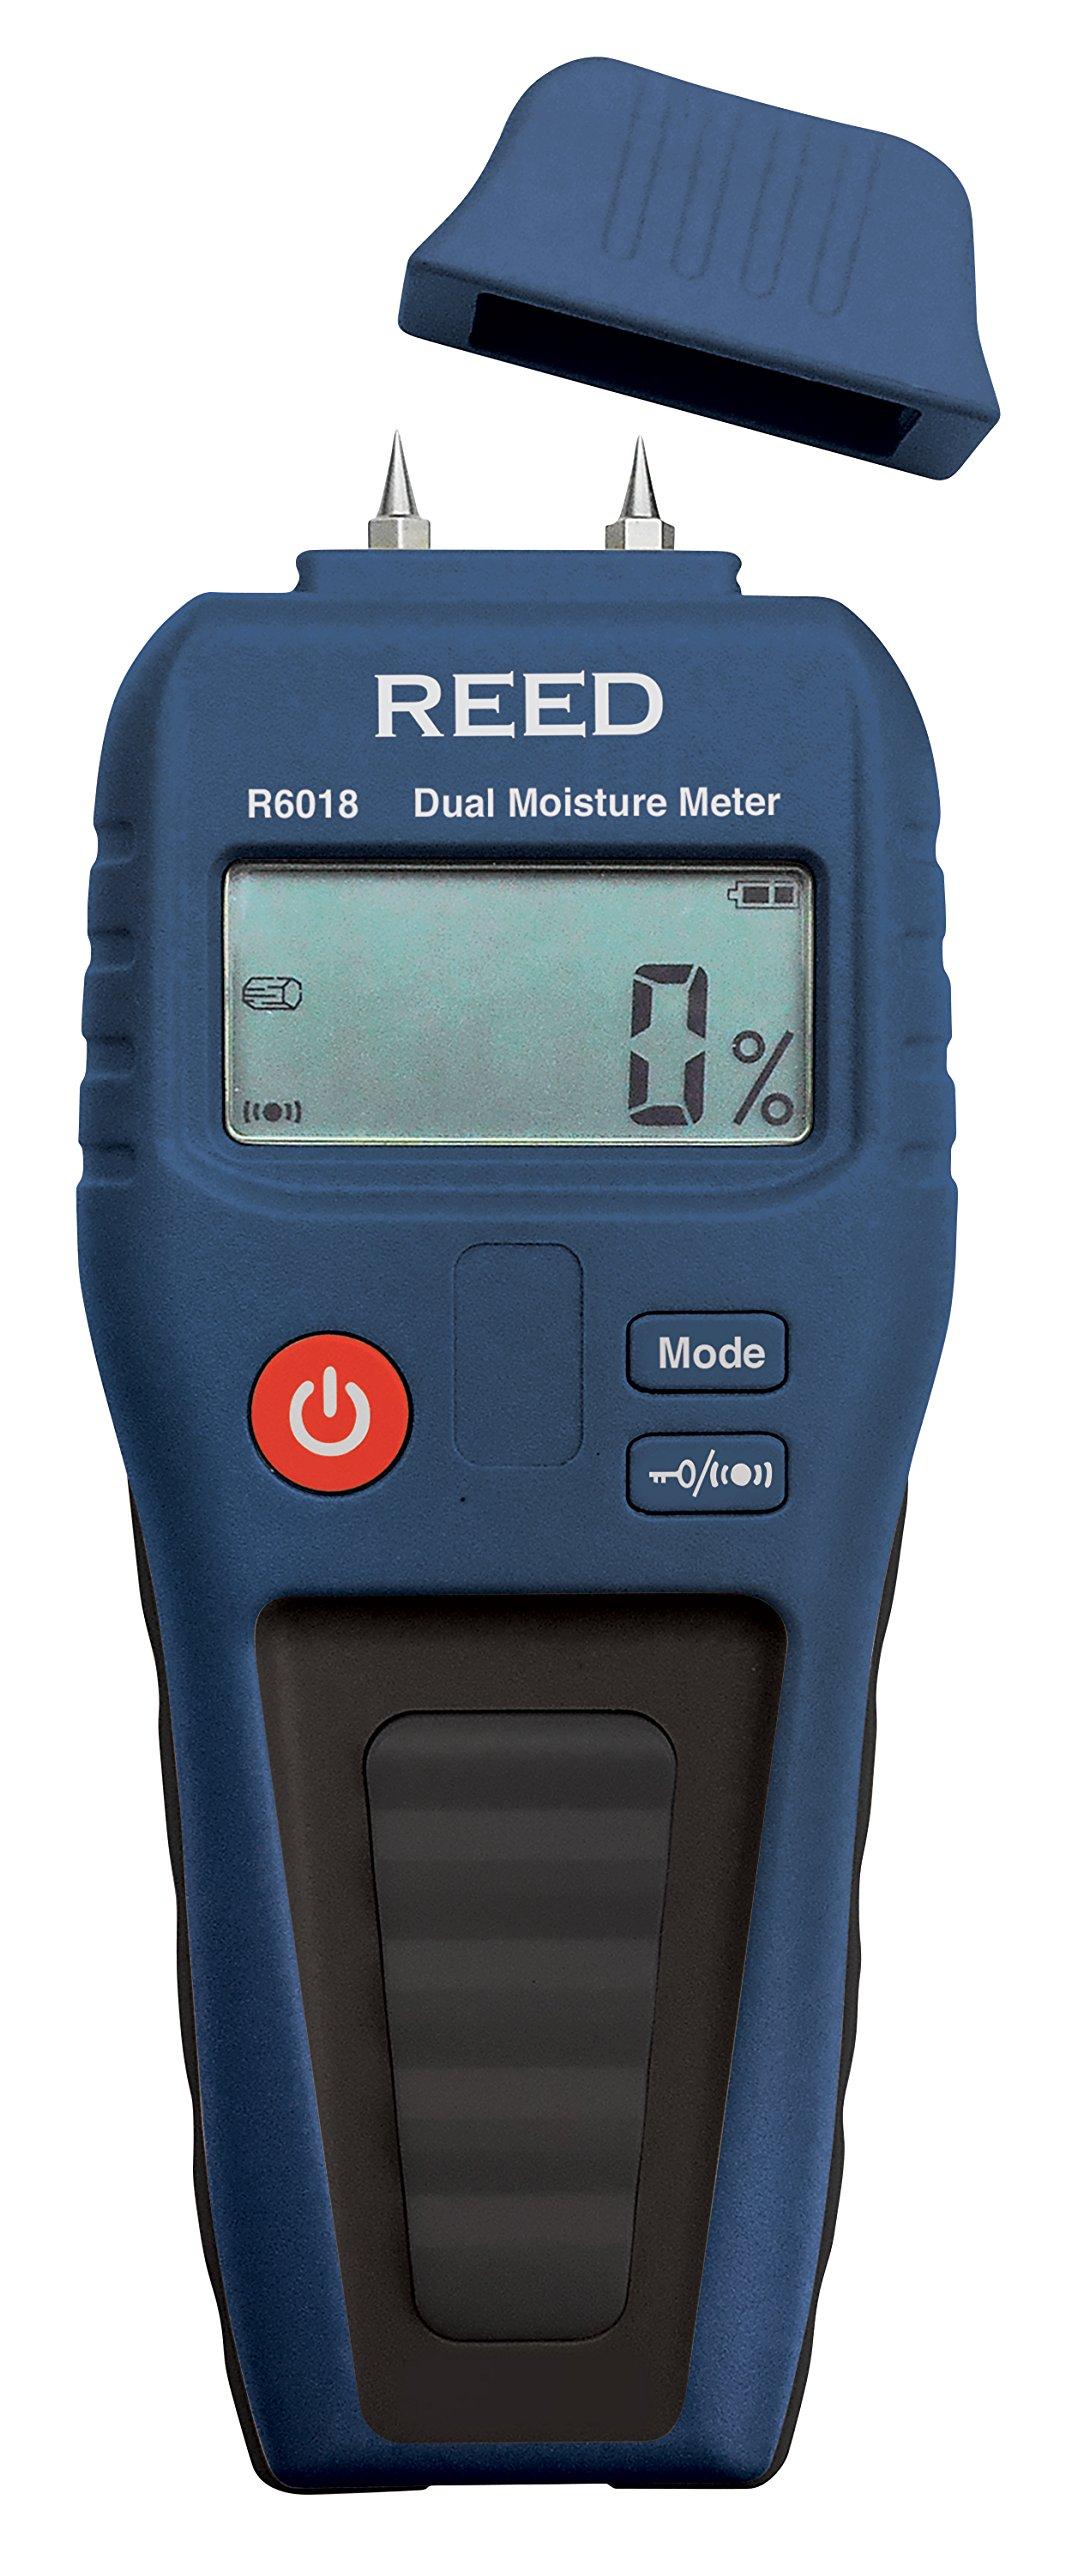 REED Instruments R6018 Dual Moisture Meter, Pin/Pinless